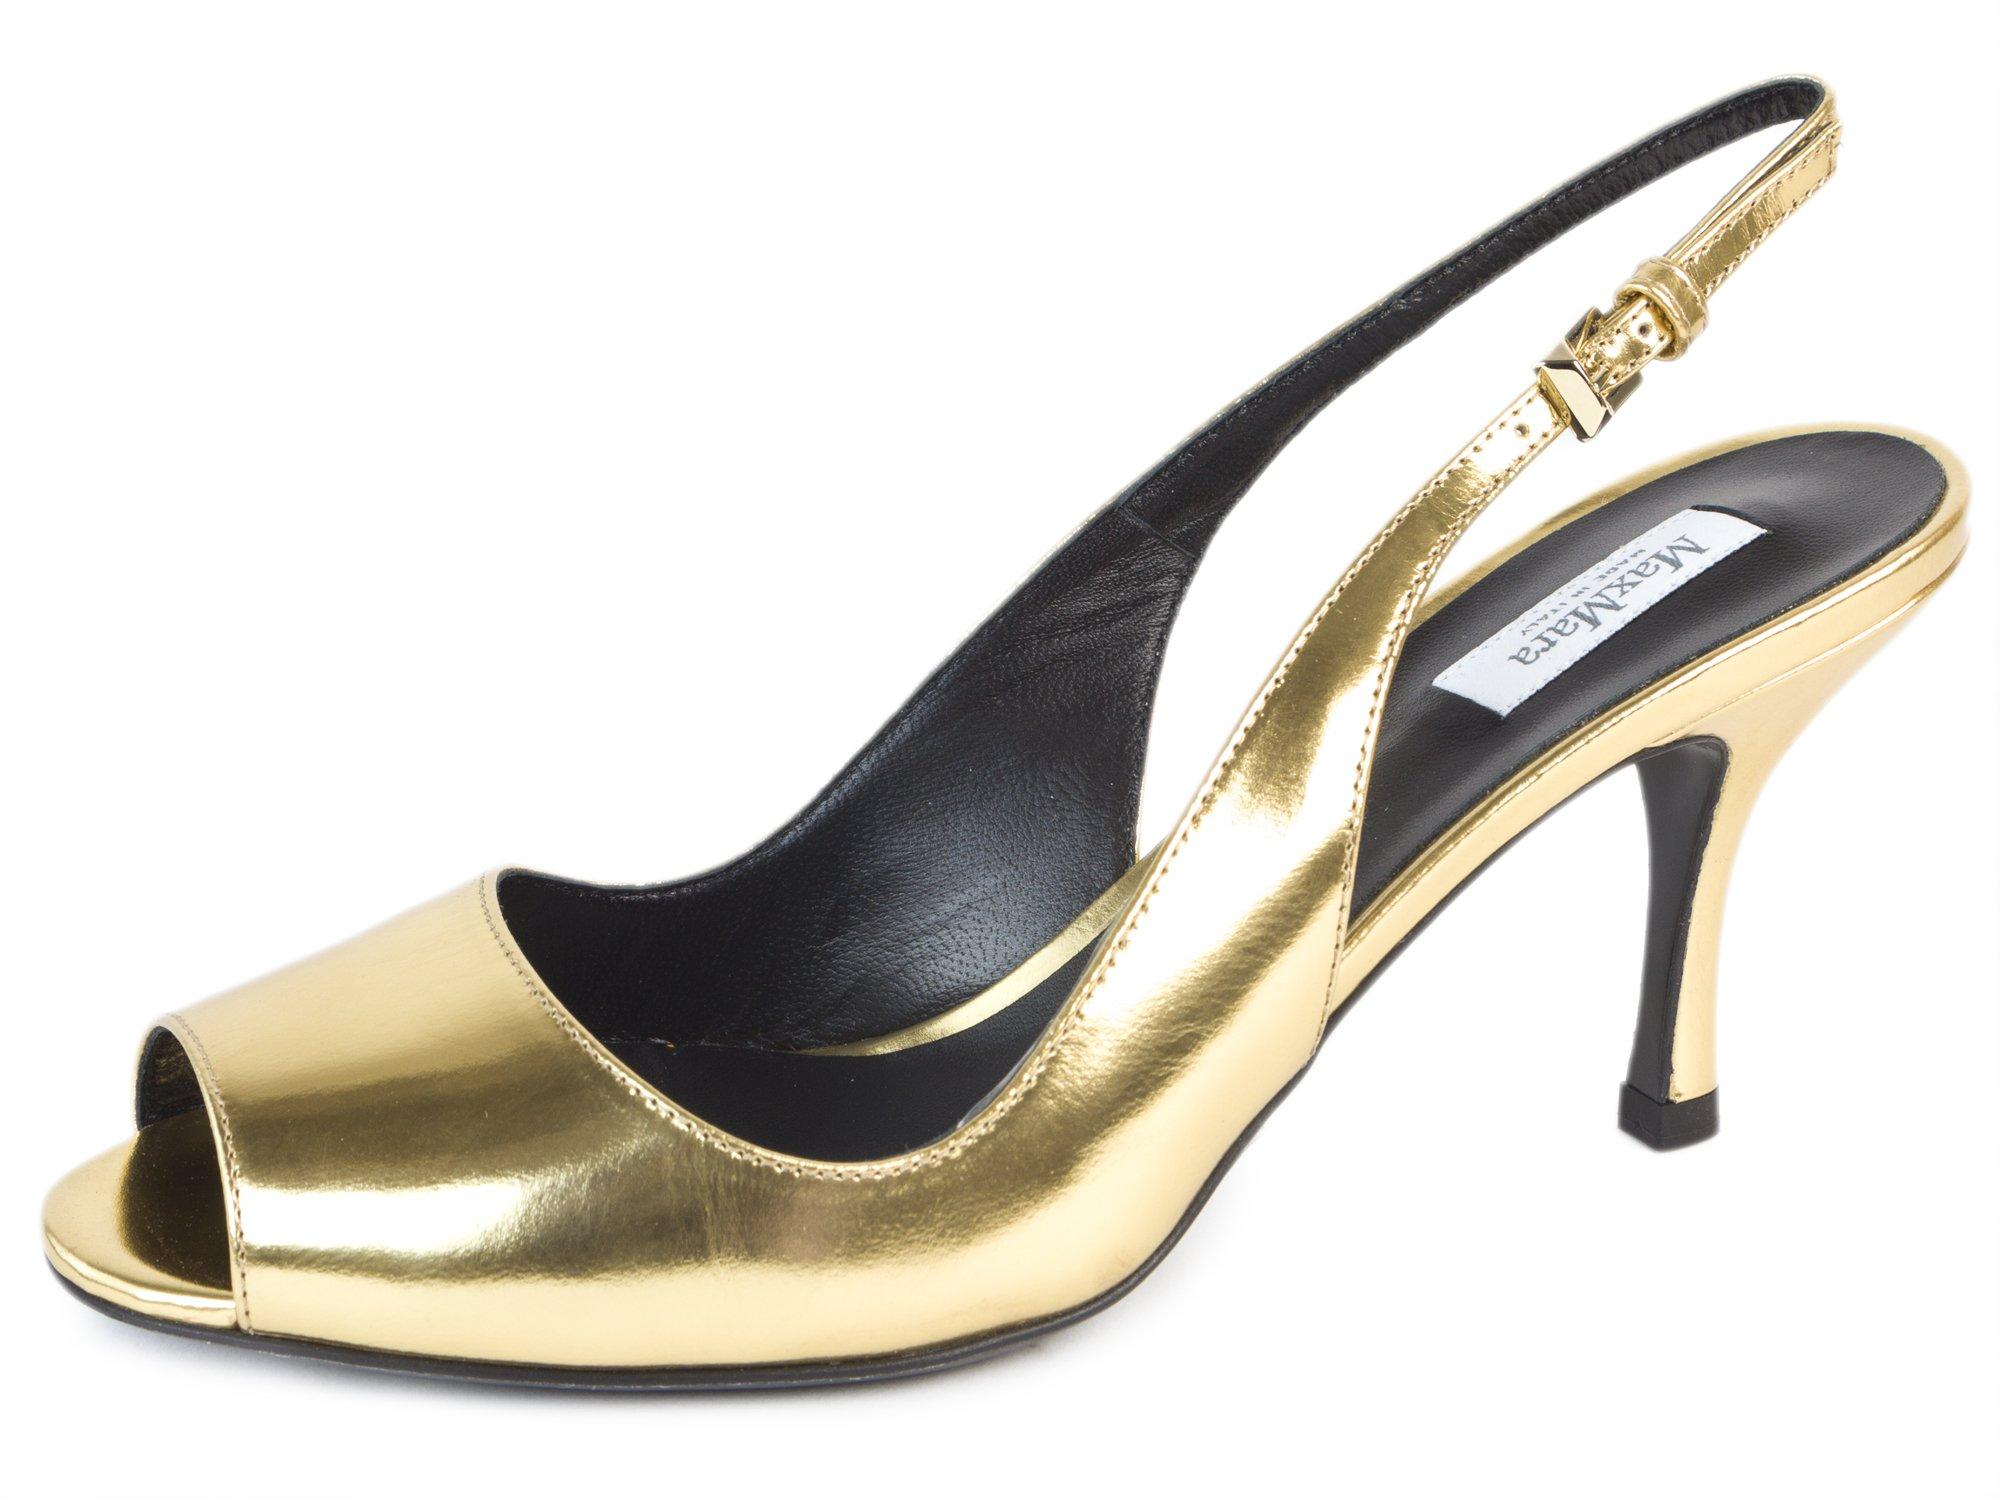 MaxMara Women's Capara Leather Slingback Pumps US 7/IT 37 Gold